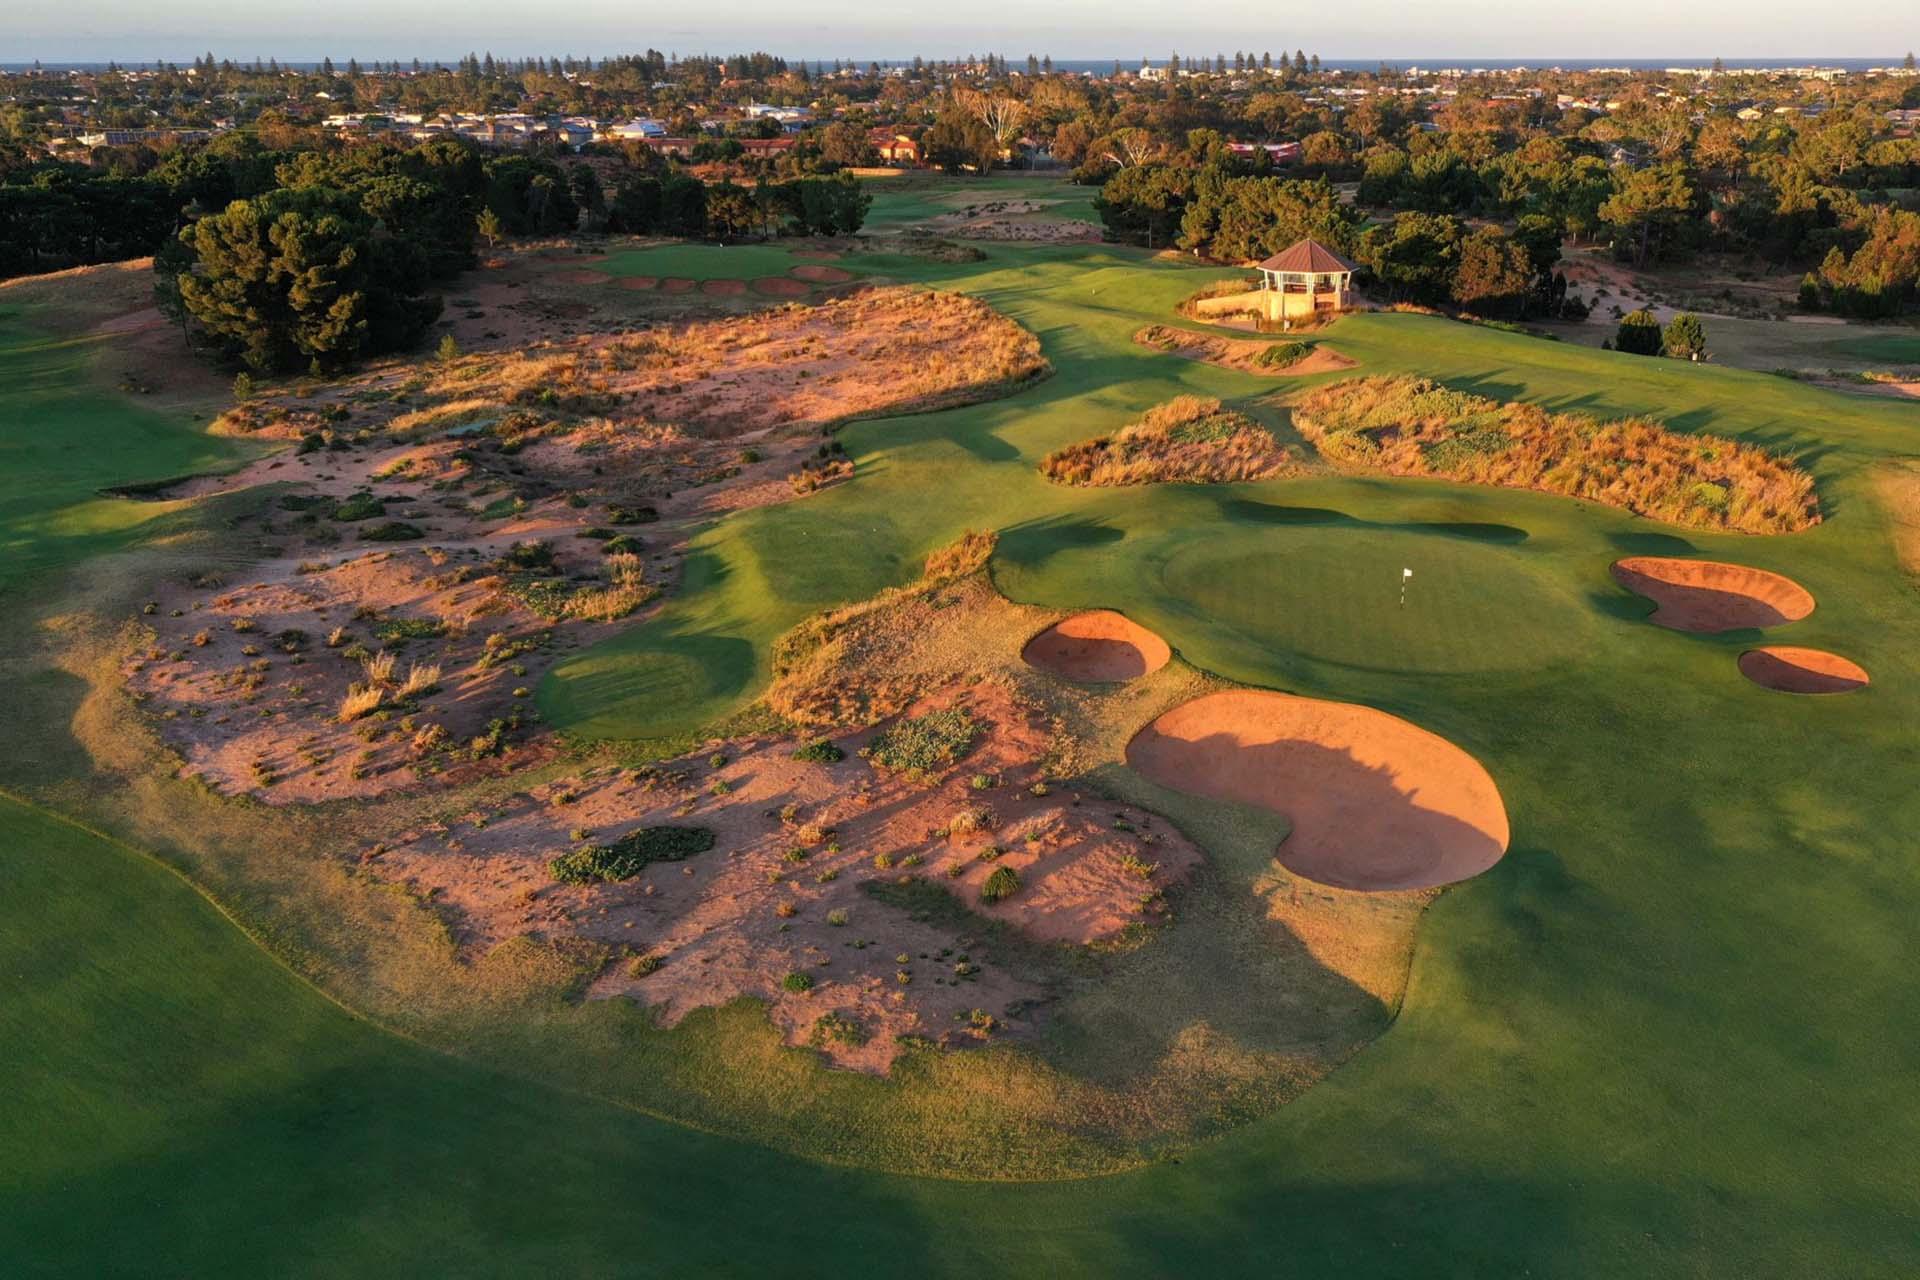 Royal Adelaide Golf Club - Par 4, 6th Green & Par 3, 7th Hole / Photo: Gary Lisbon Golf Photography